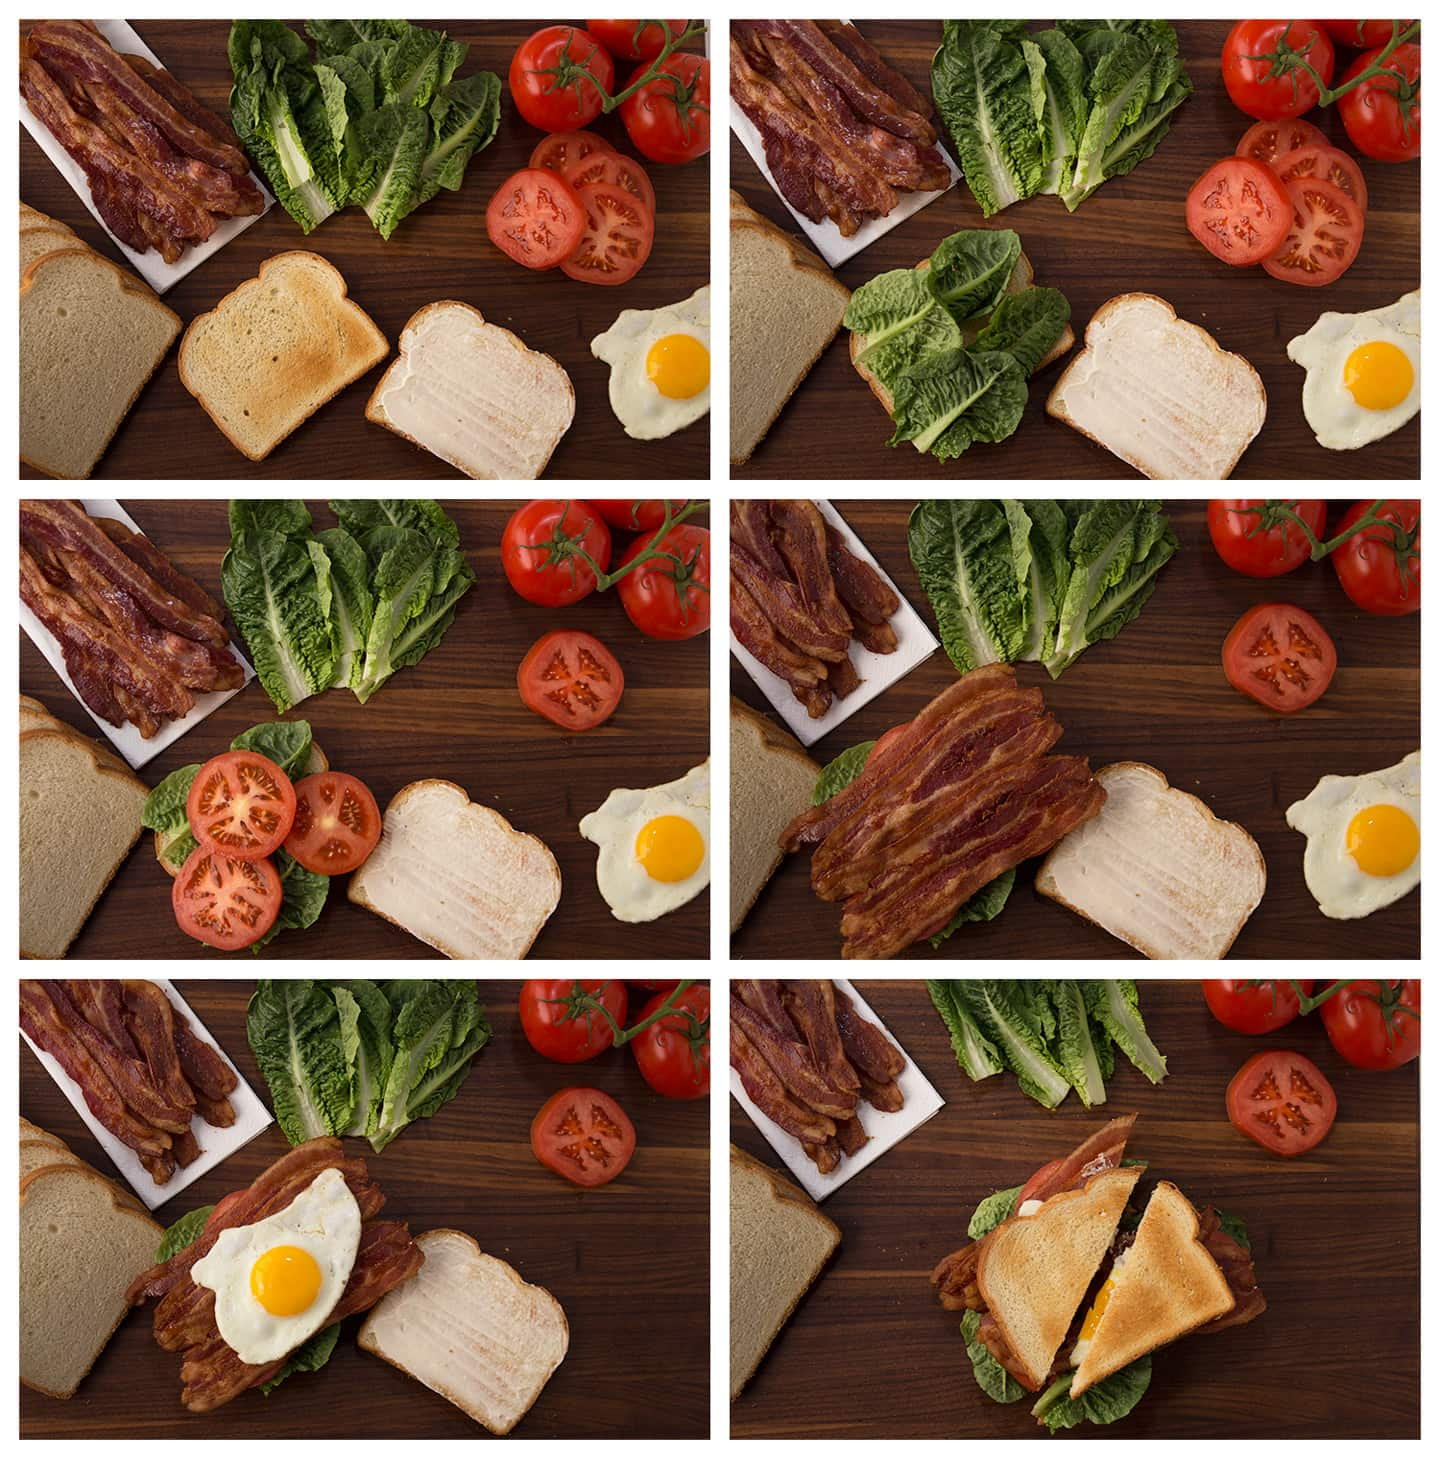 Step by step assembly of BELT sandwich (BLT + Egg)